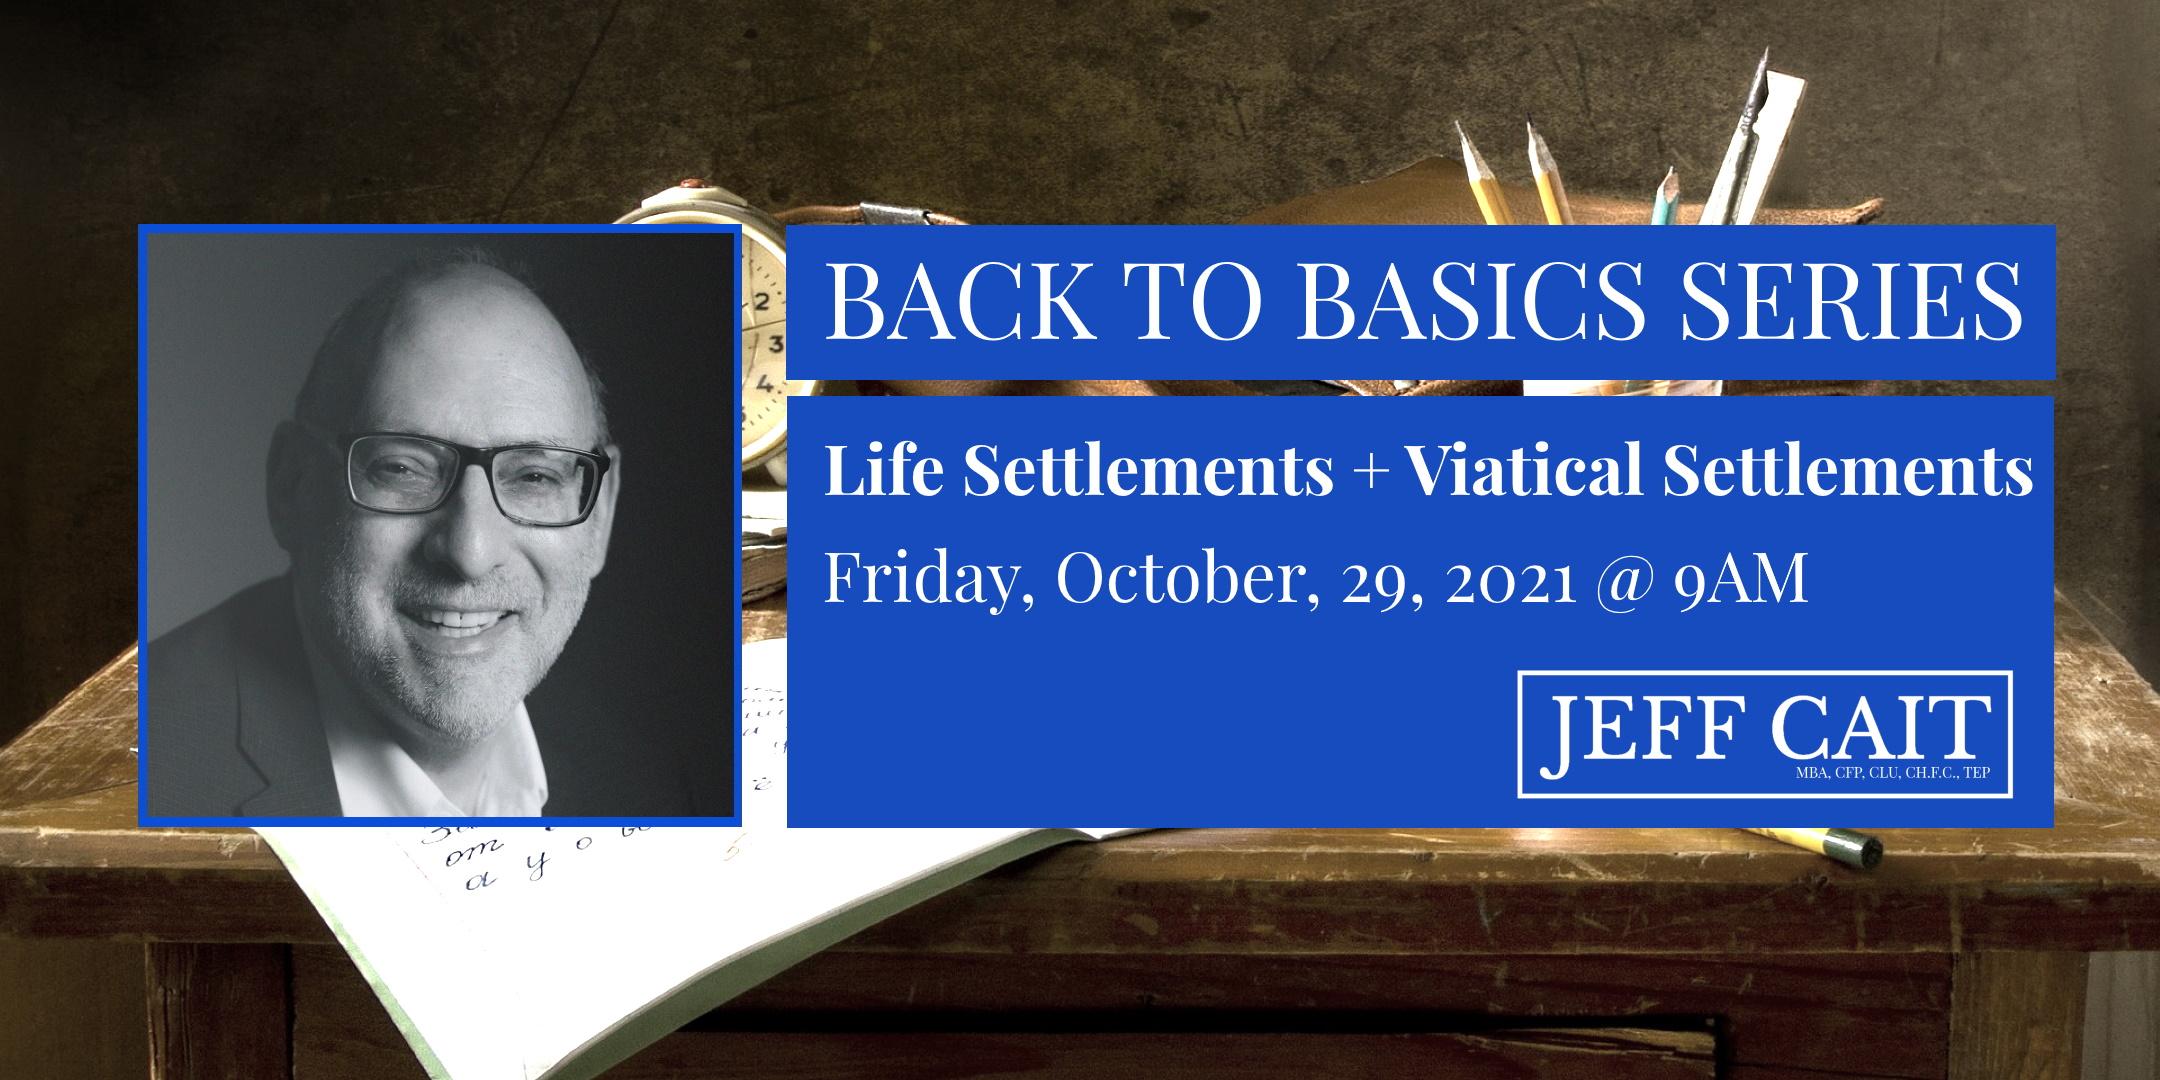 life settlements and viatical settlements